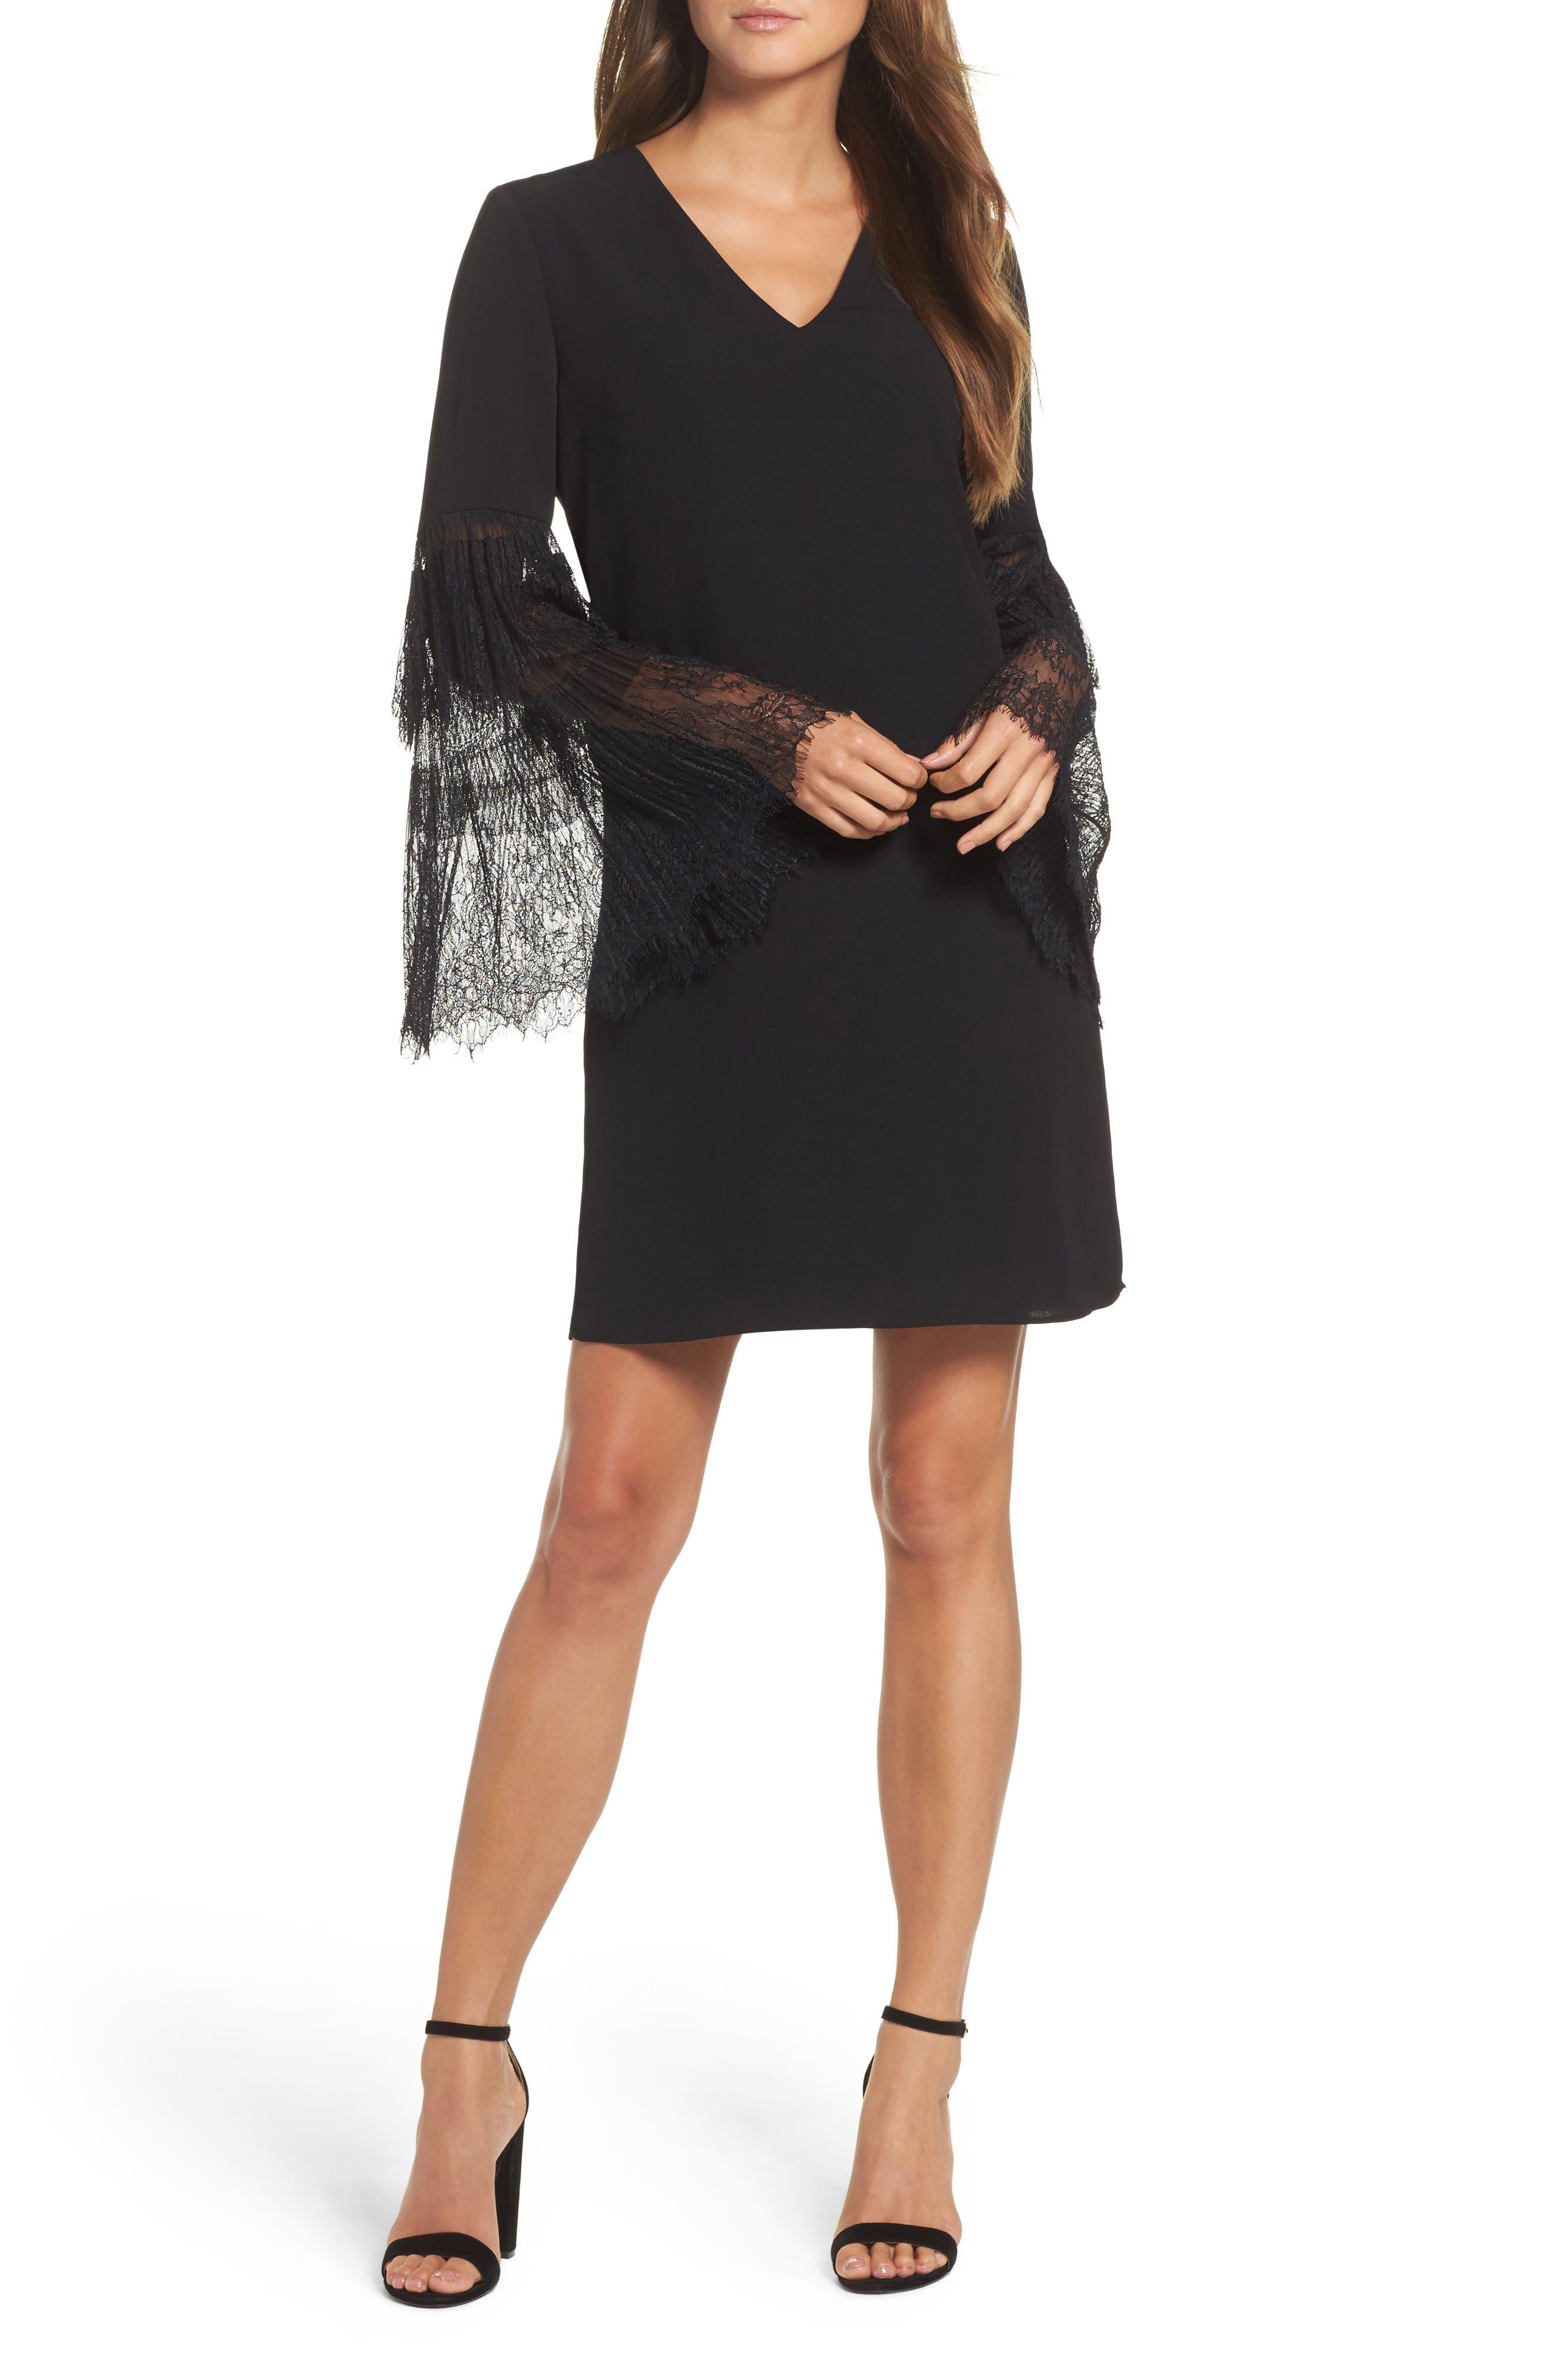 Alternate Image 1 Selected - Kobi Halperin Suki Lace Sleeve Shift Dress (Nordstrom Exclusive)